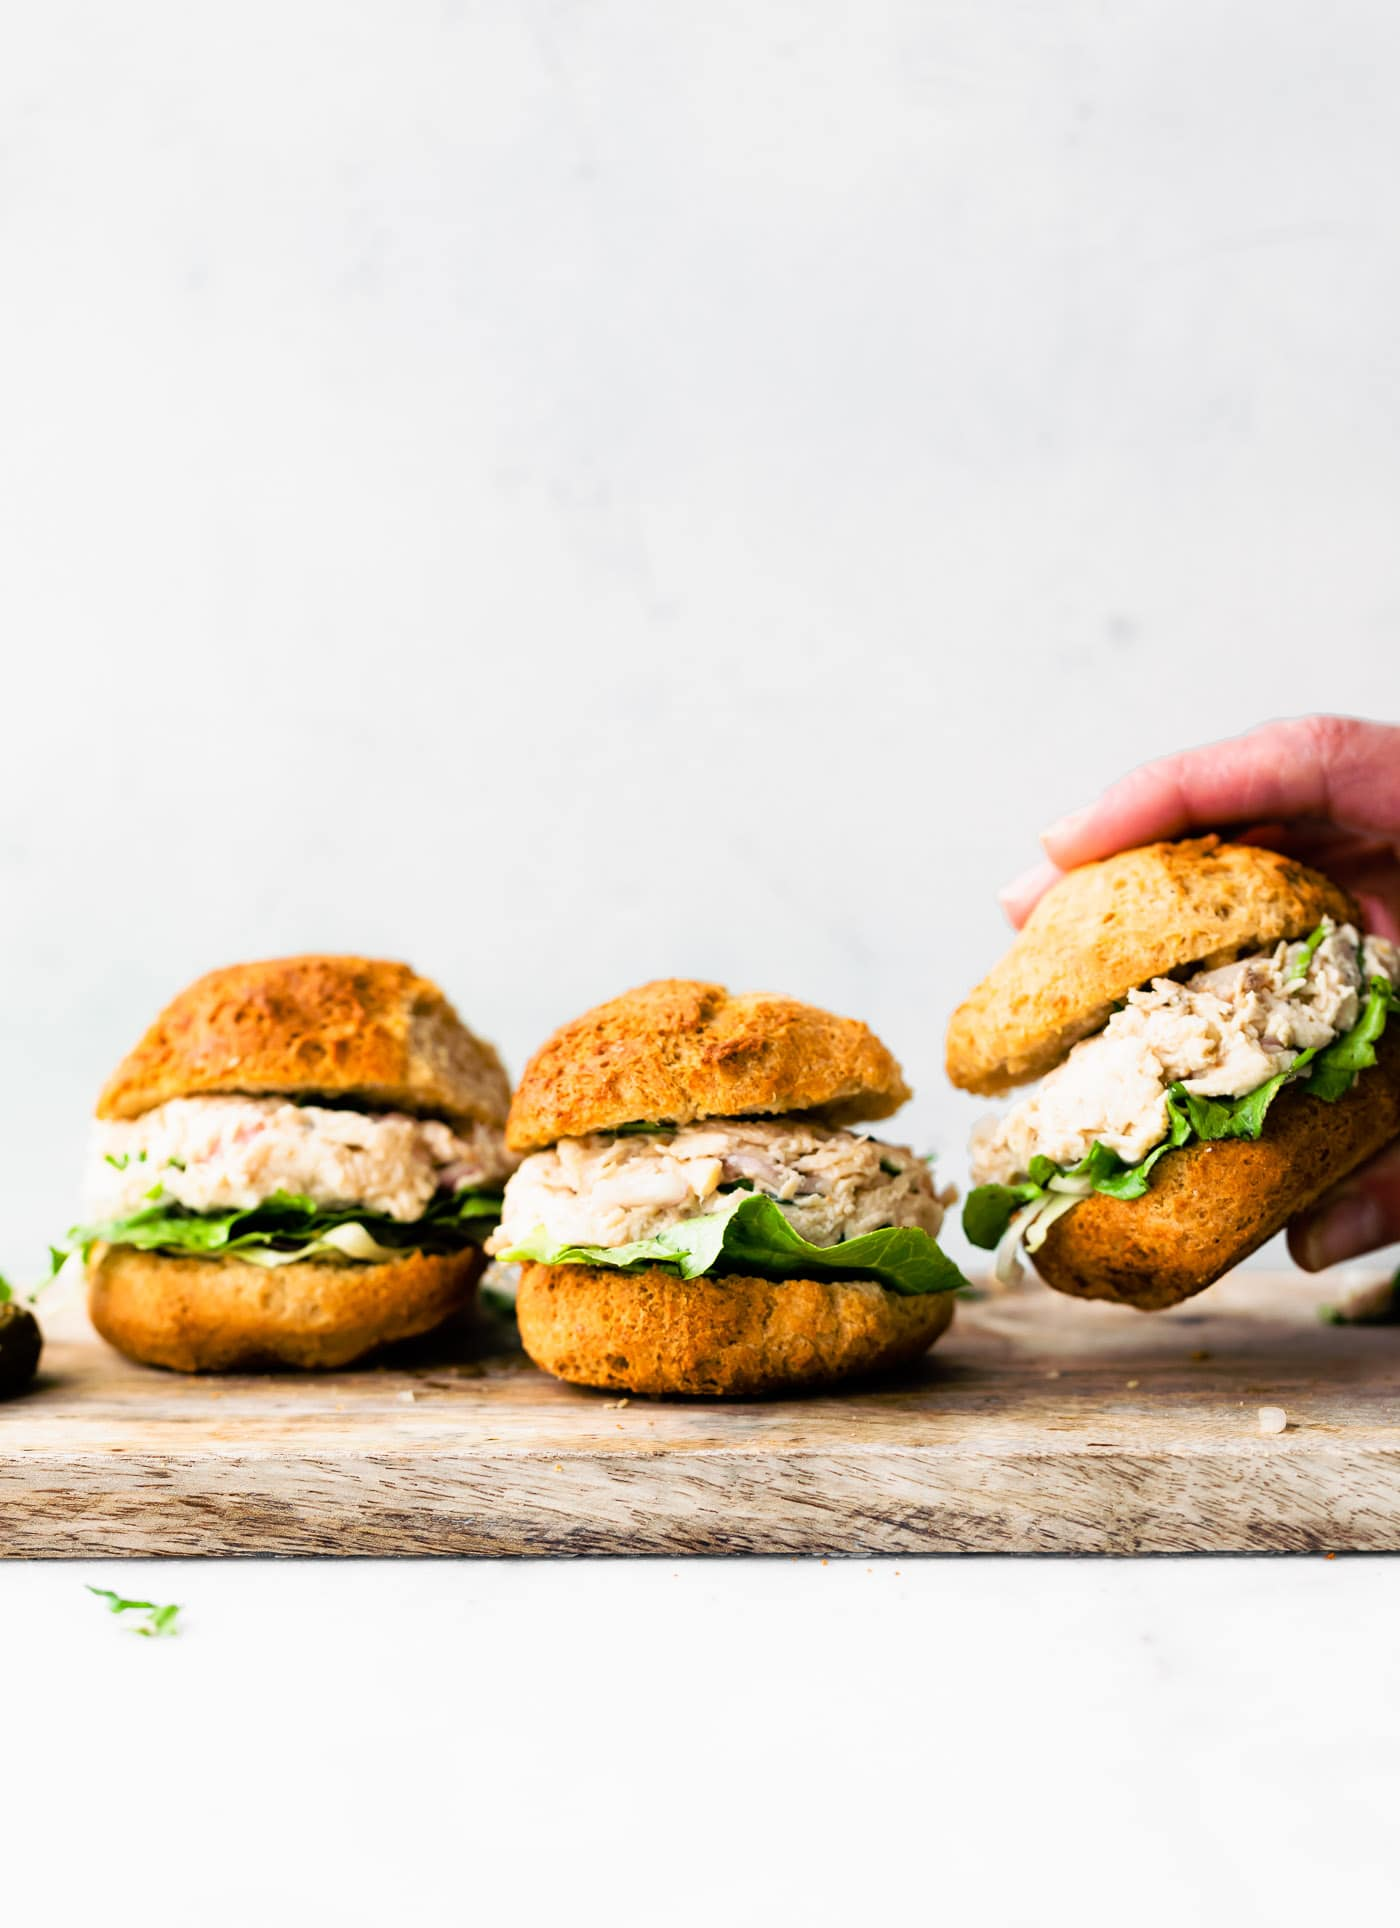 Side image of three chicken salad sandwiches.